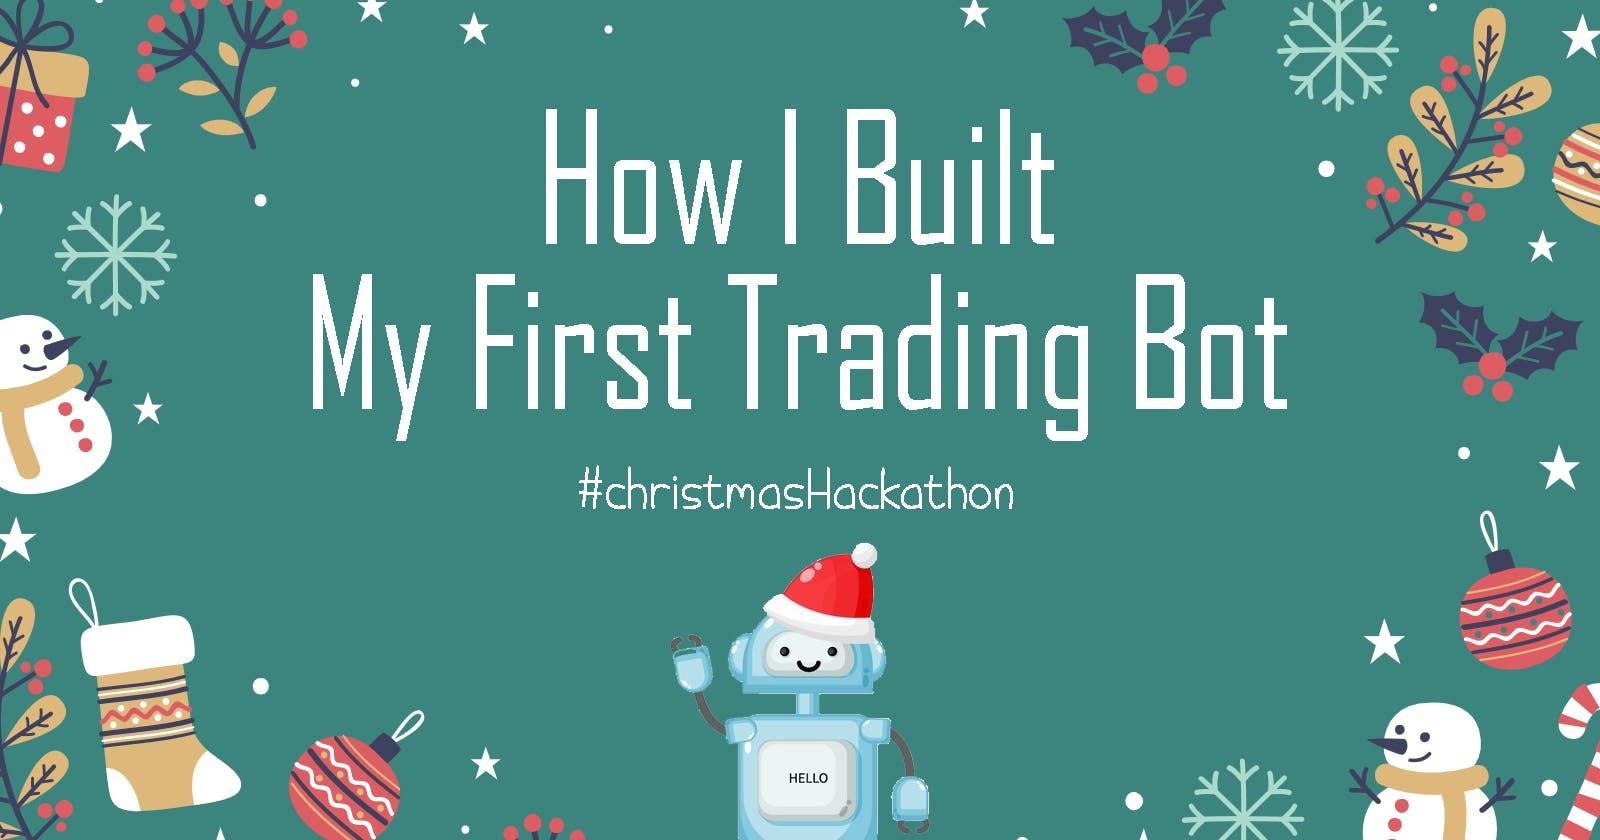 How I Built My First Trading Bot For Hashnode's Hackathon